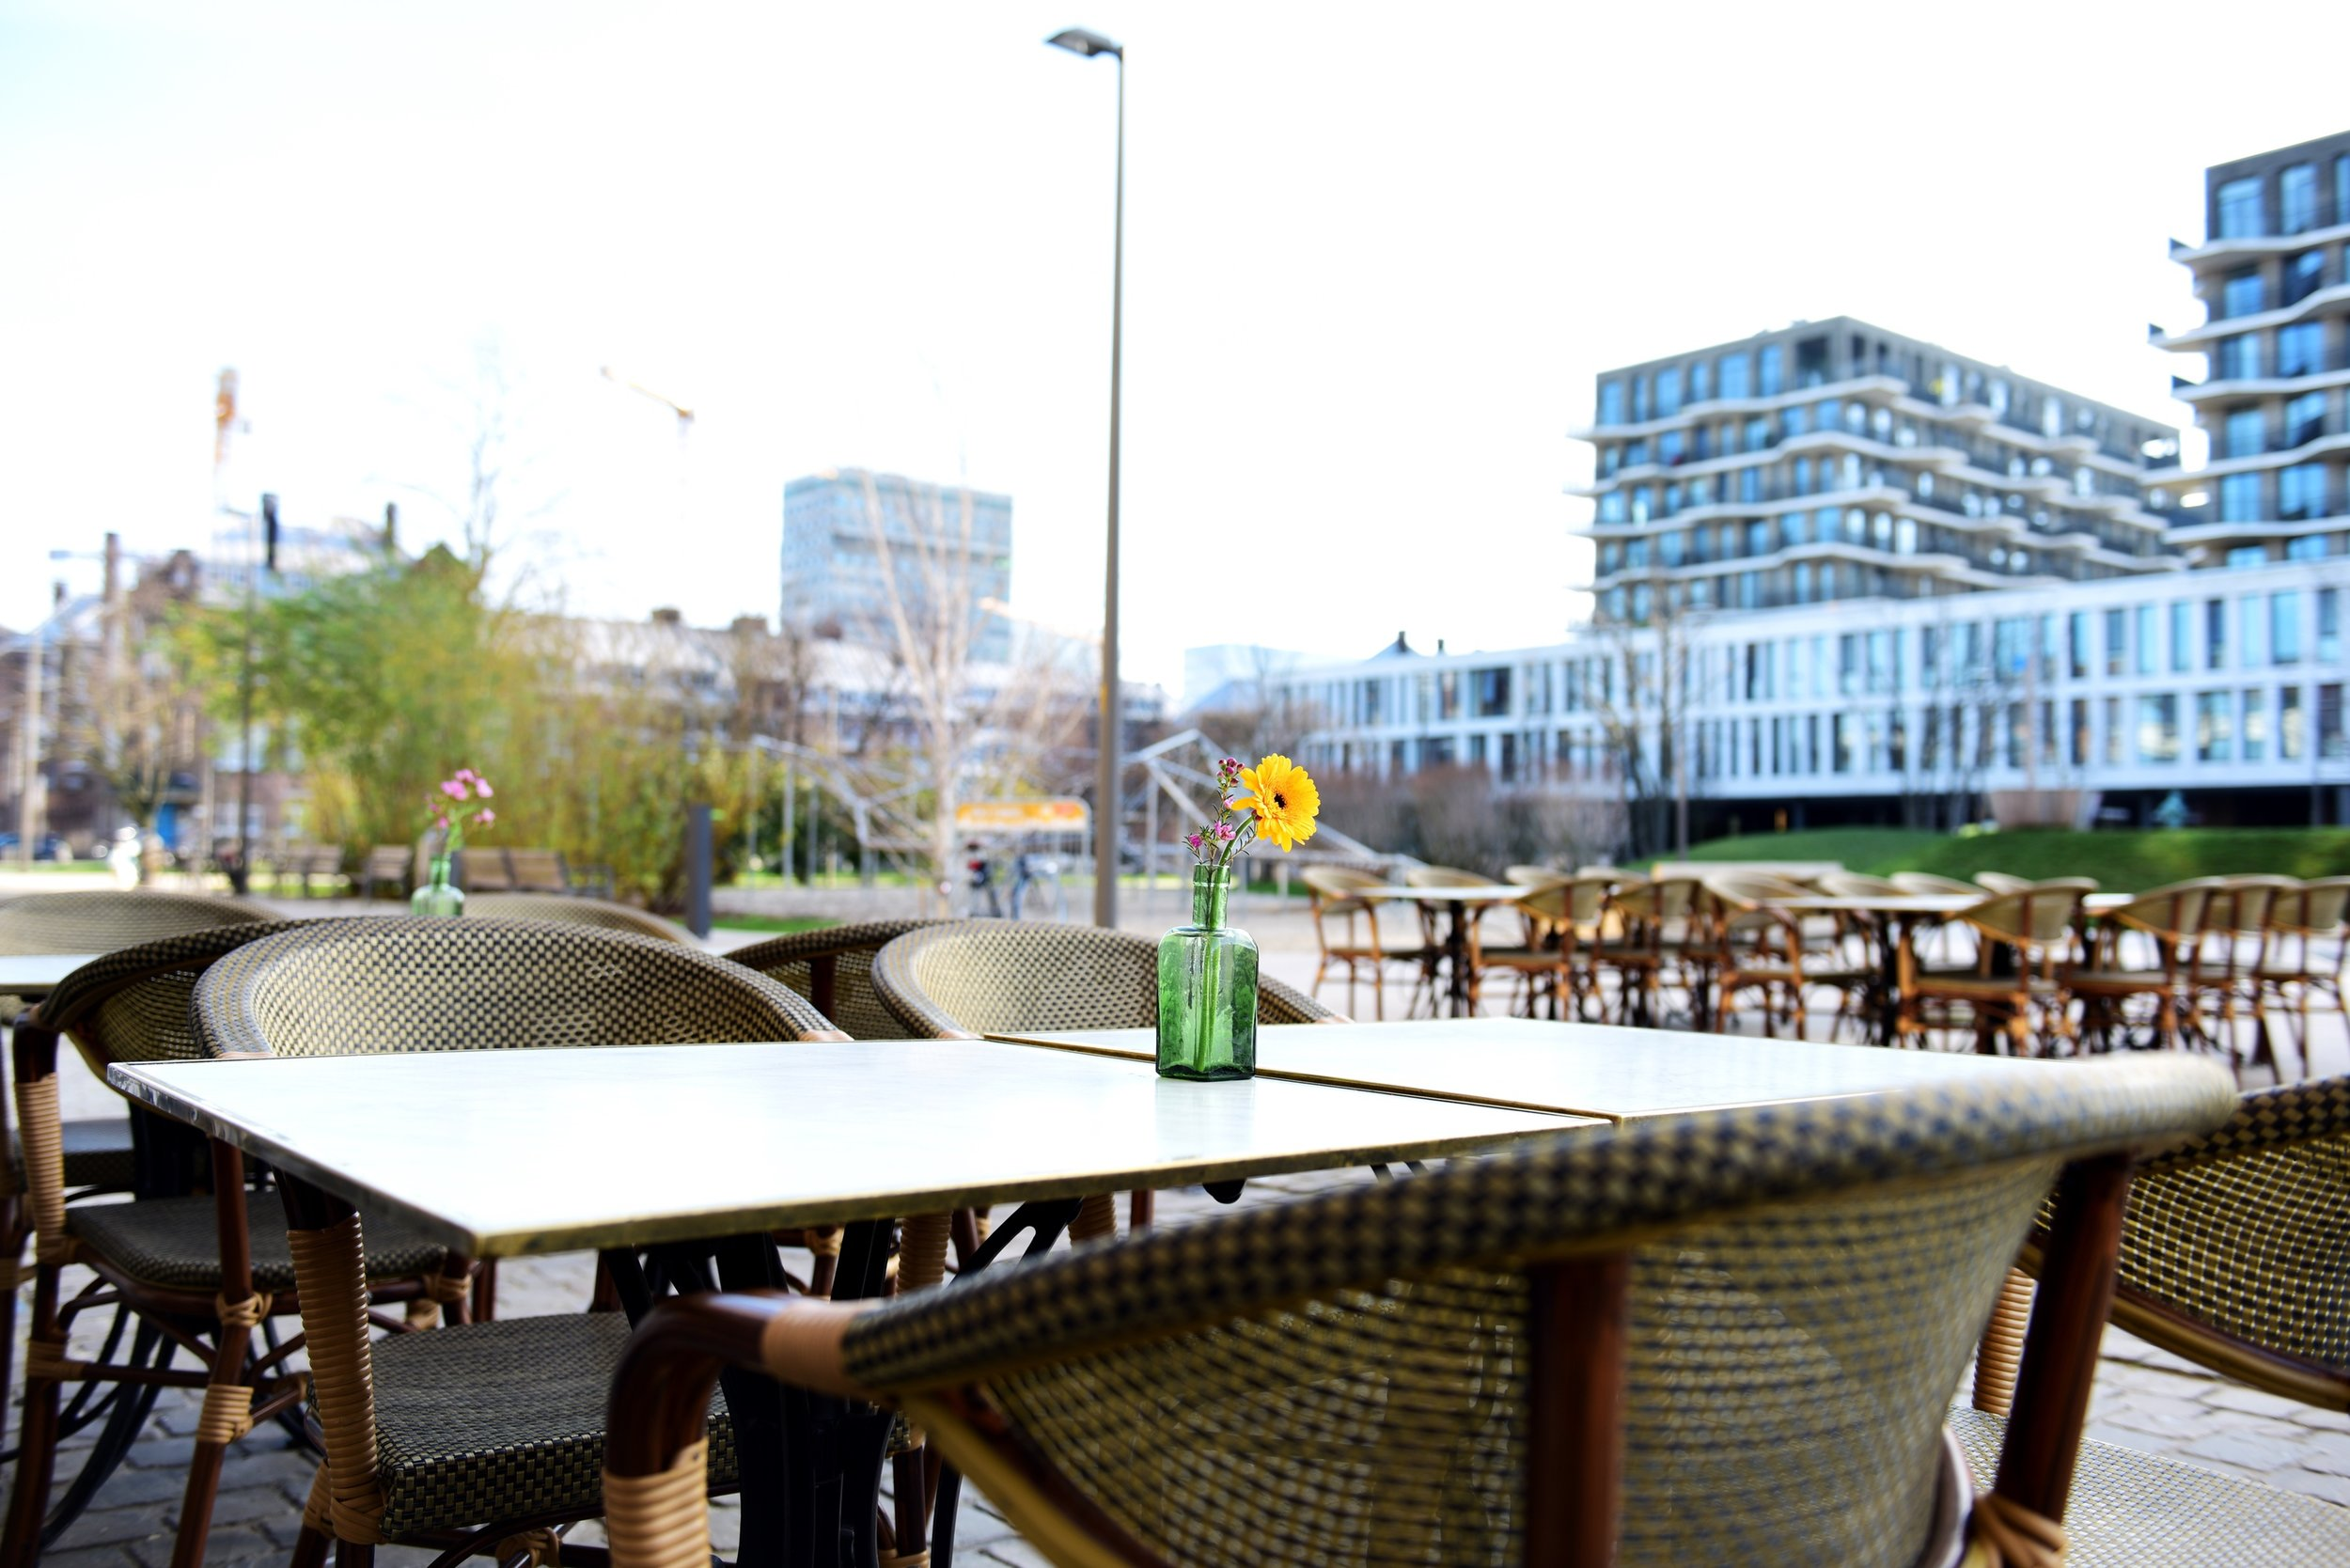 13 la pipe d anvers antwerpen brasserie antwerp best restaurant tablefever.jpg